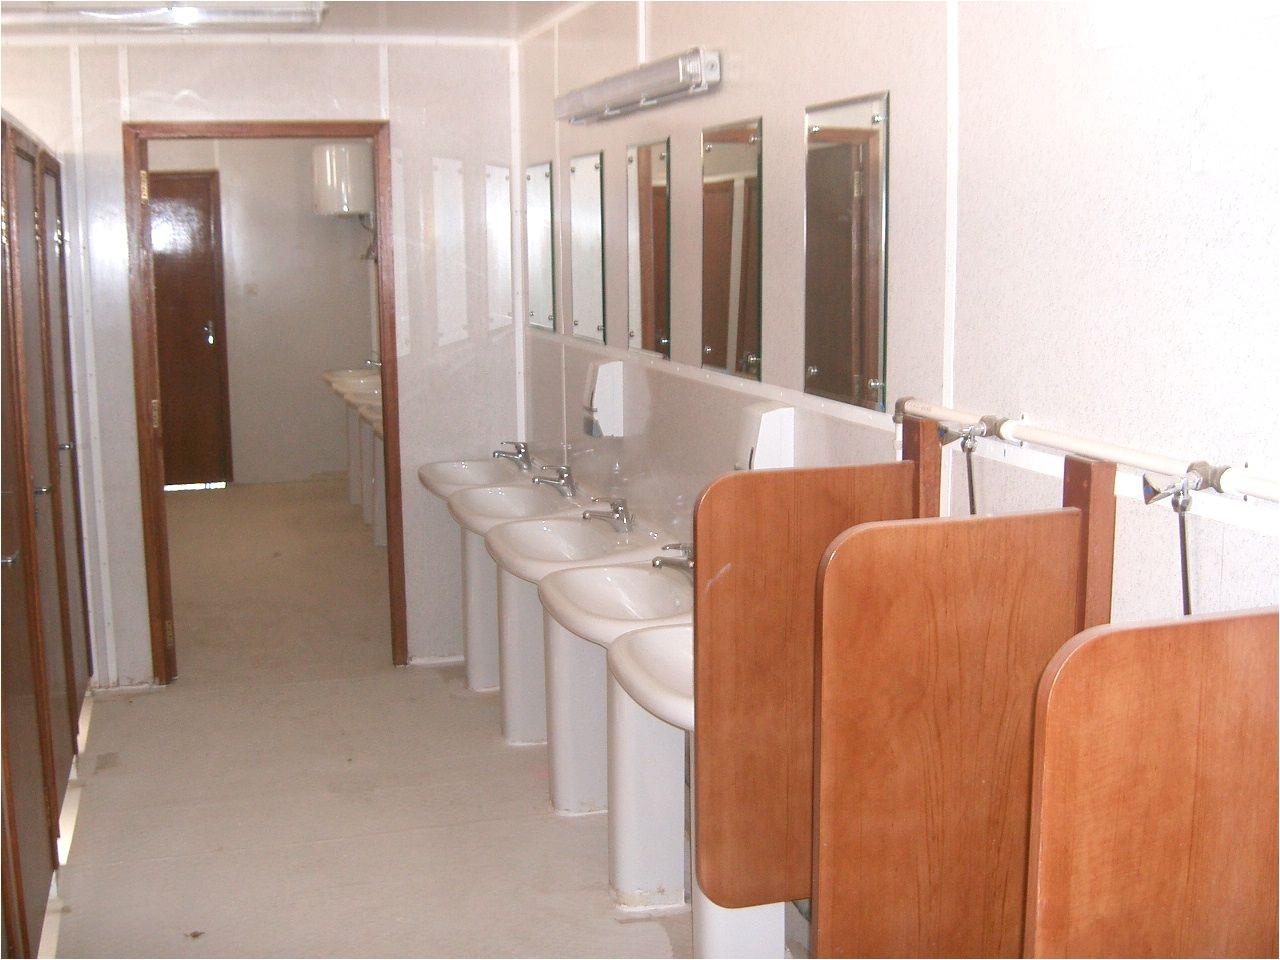 vip ablution unit interior portable chemical toilet www modestcompany com